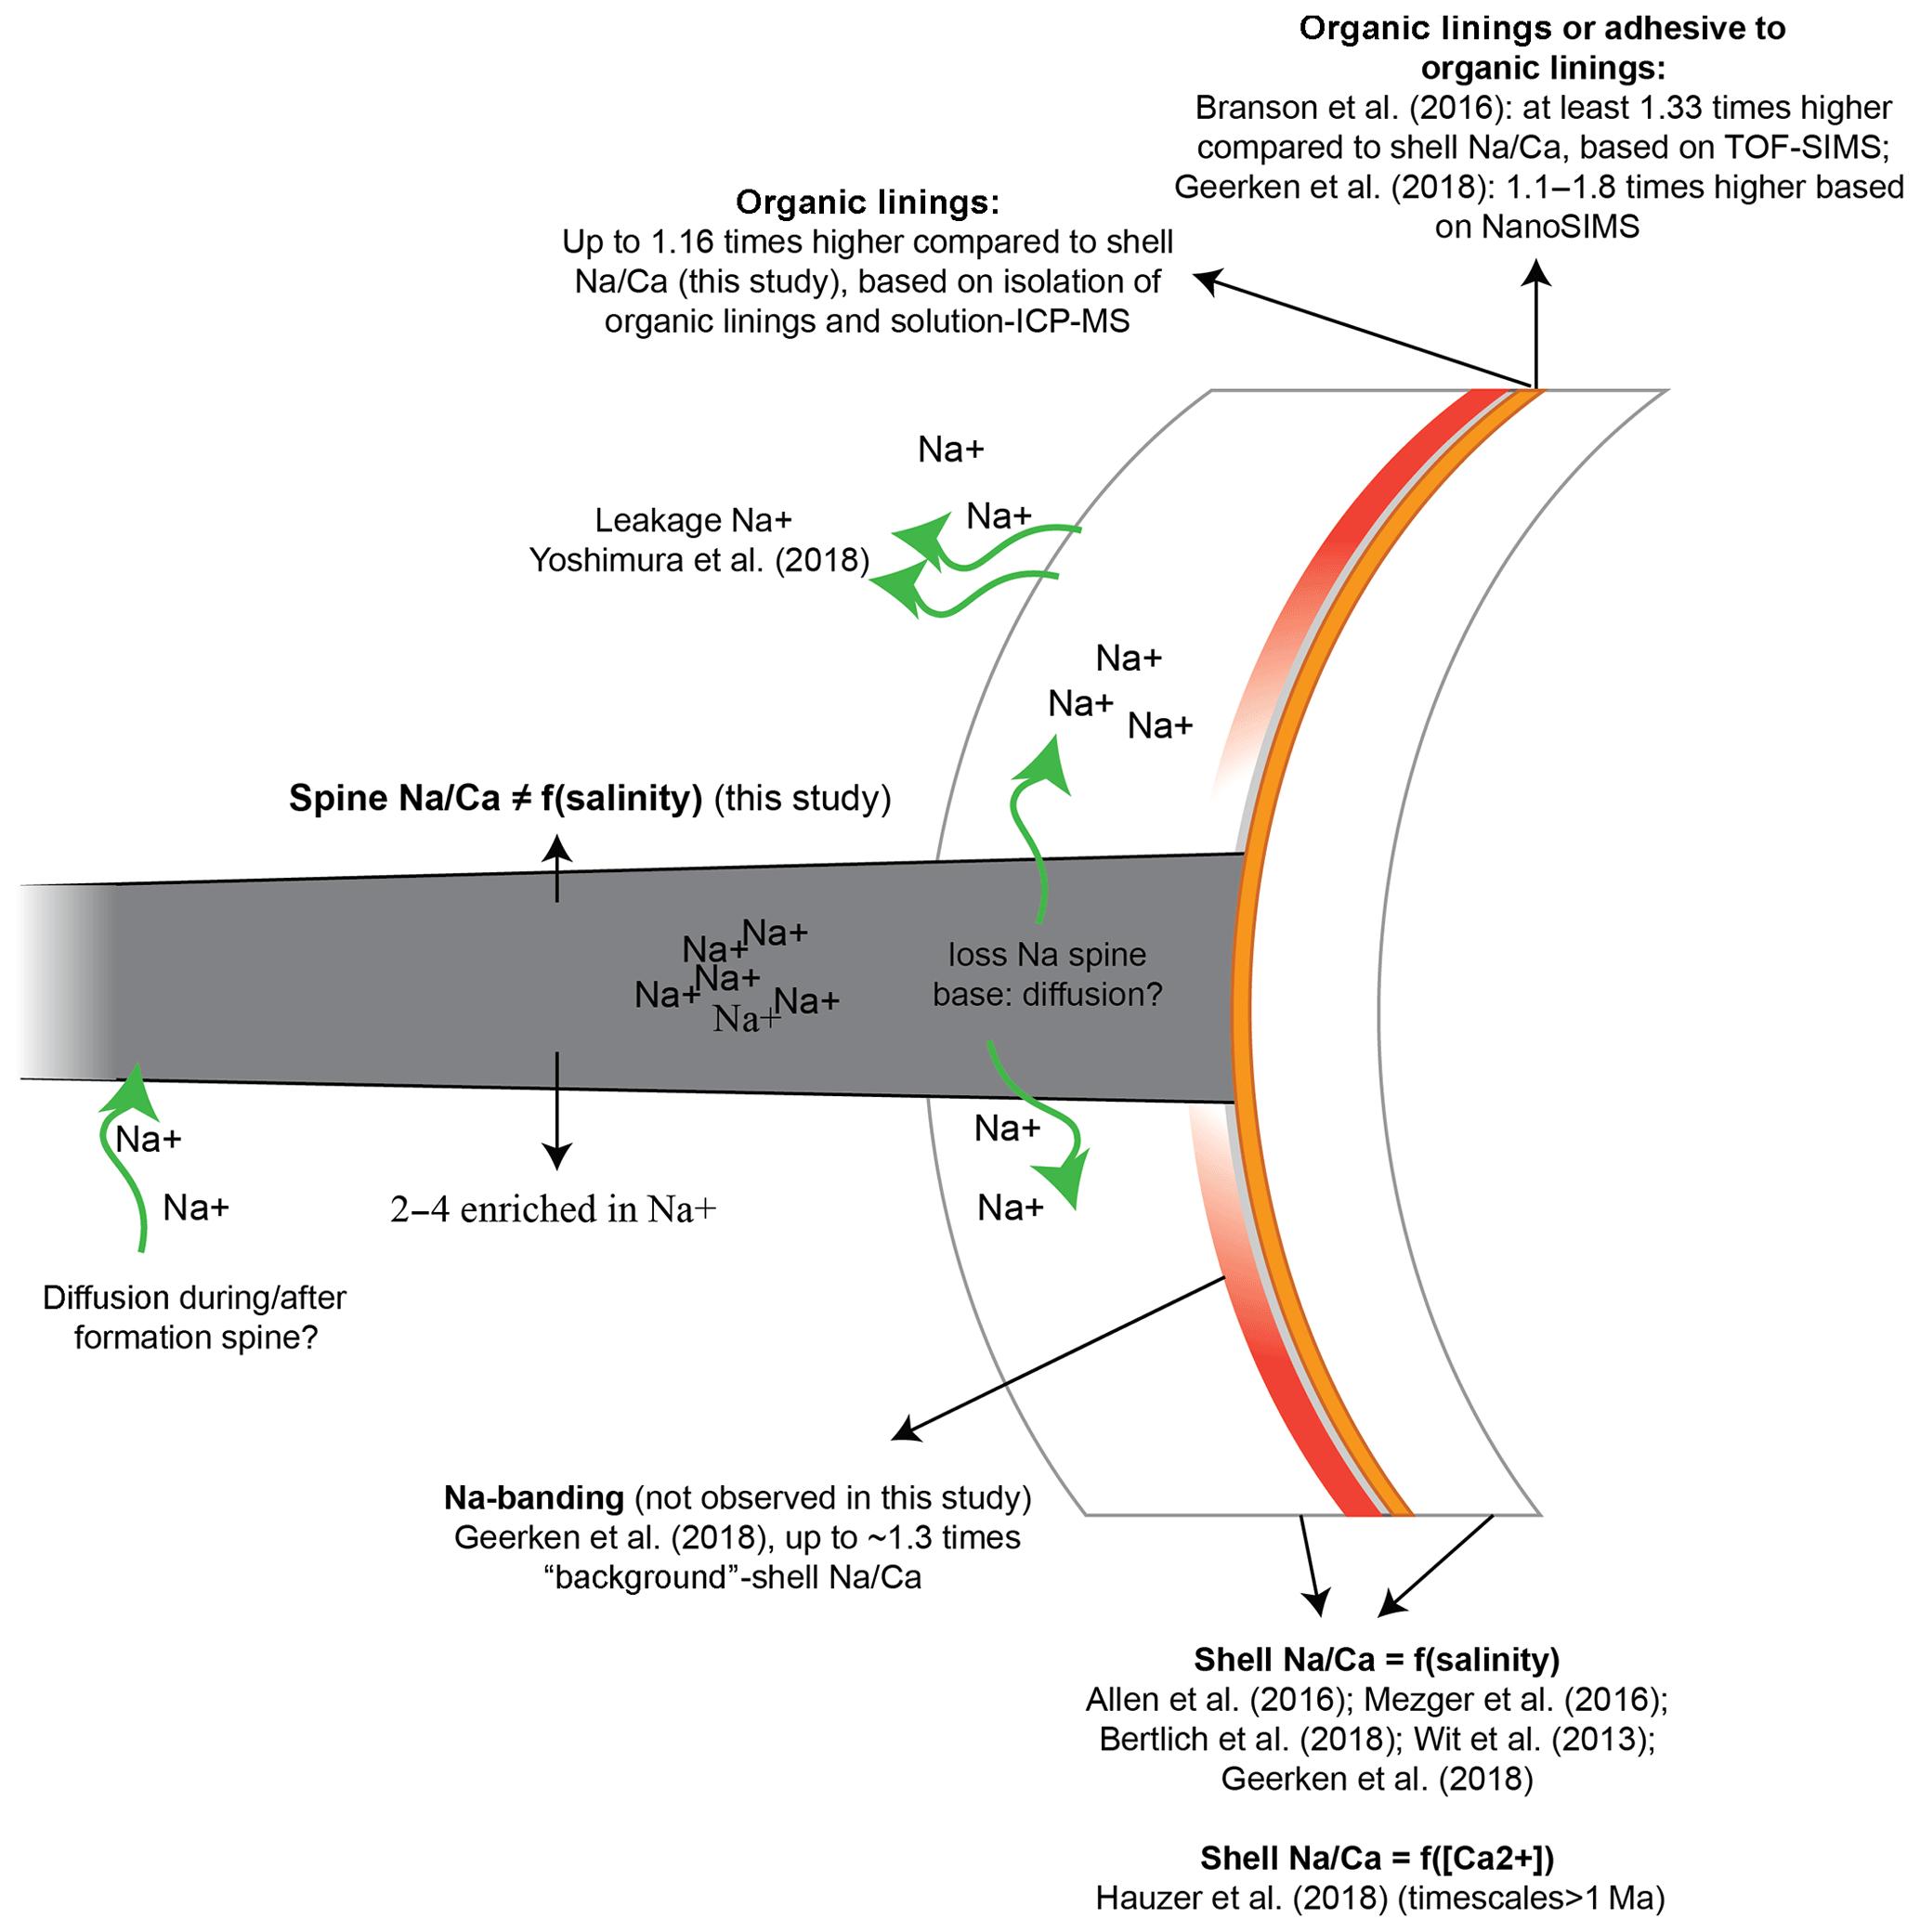 BG - Planktonic foraminiferal spine versus shell carbonate